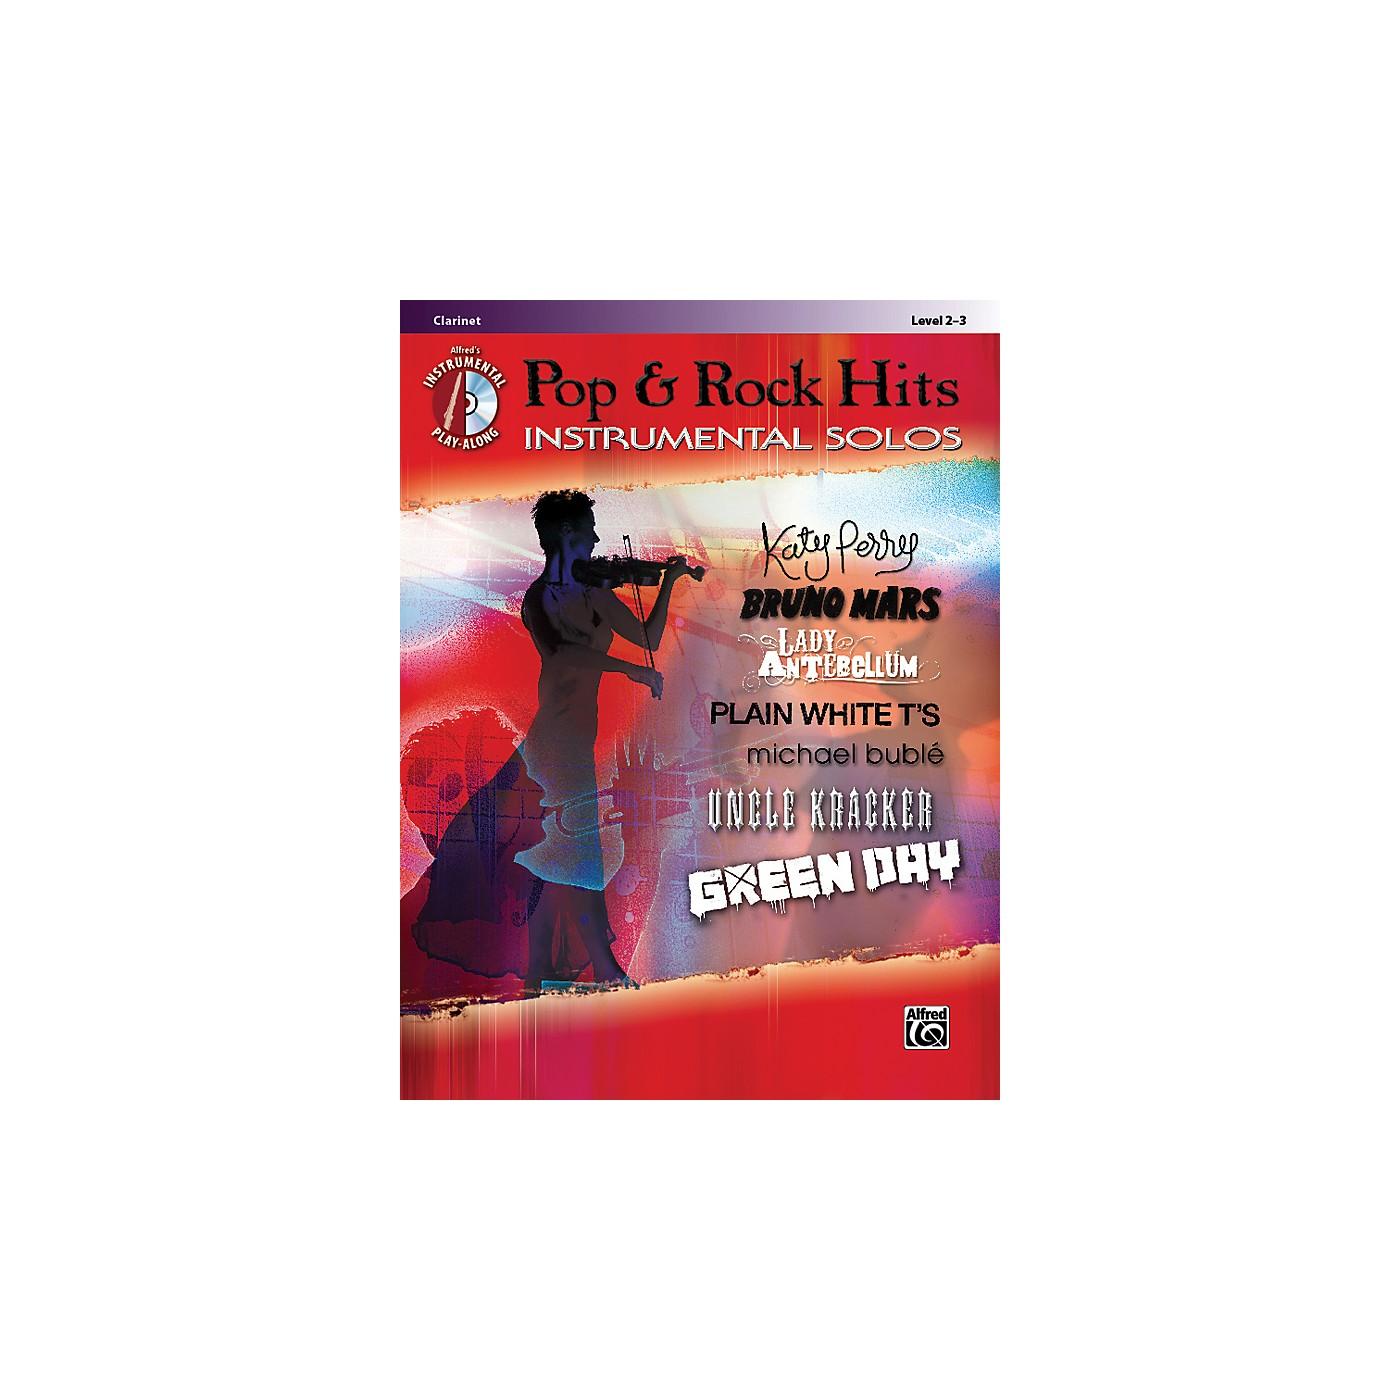 Alfred Pop & Rock Hits Instrumental Solos Clarinet Book & CD thumbnail